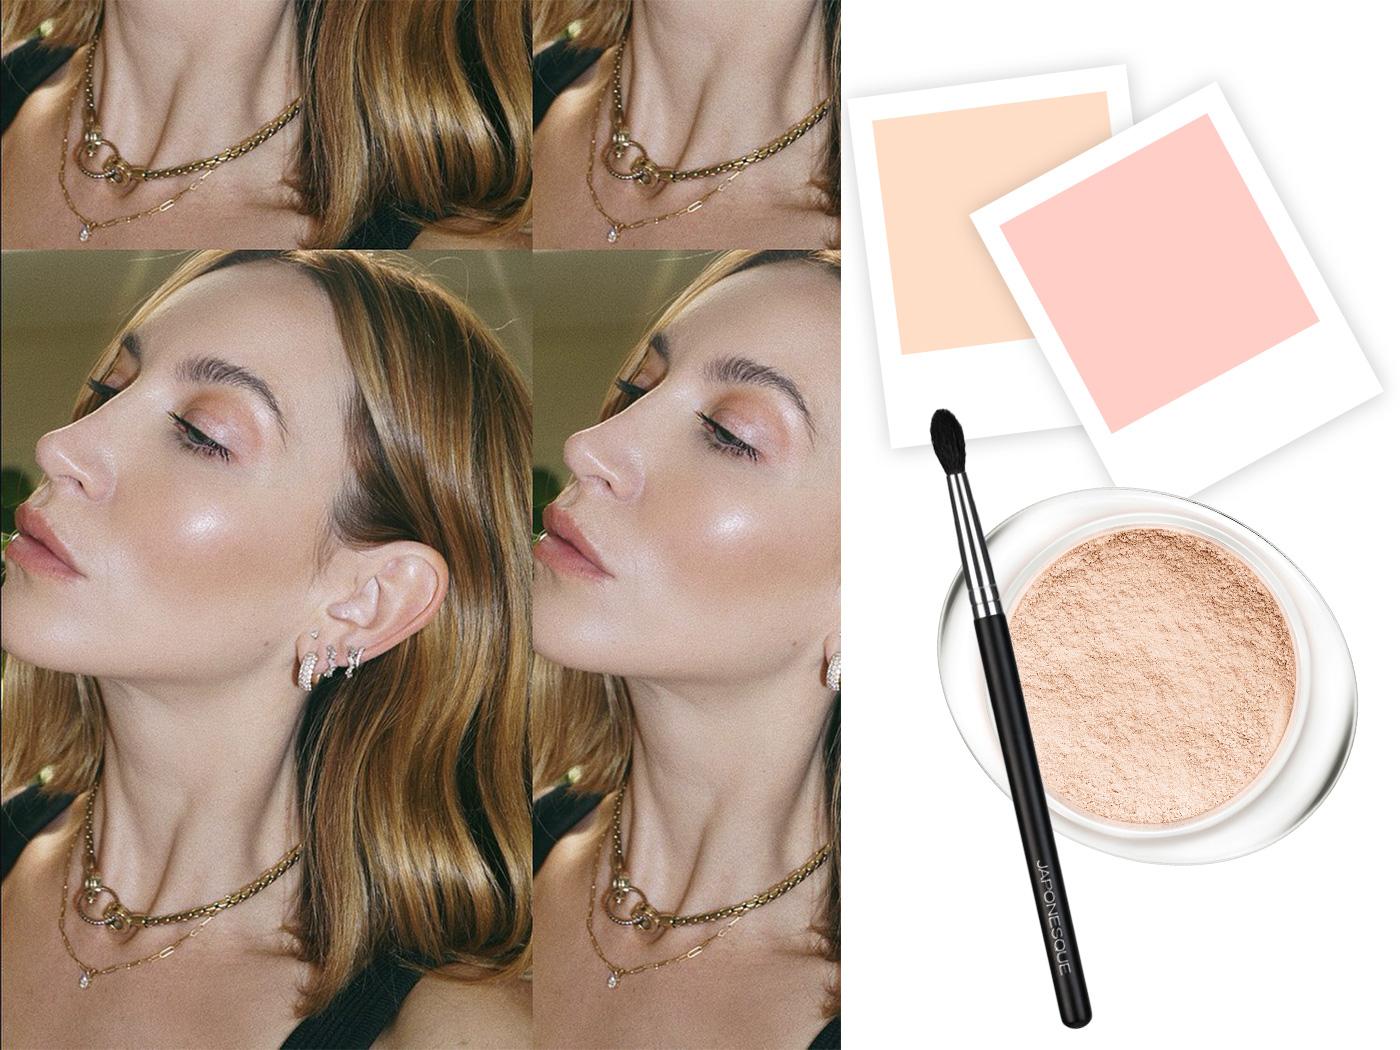 Pinpoint powdering: η makeup artist της Hailey Bieber μόλις μας έπεισε να αγοράσουμε loose powder